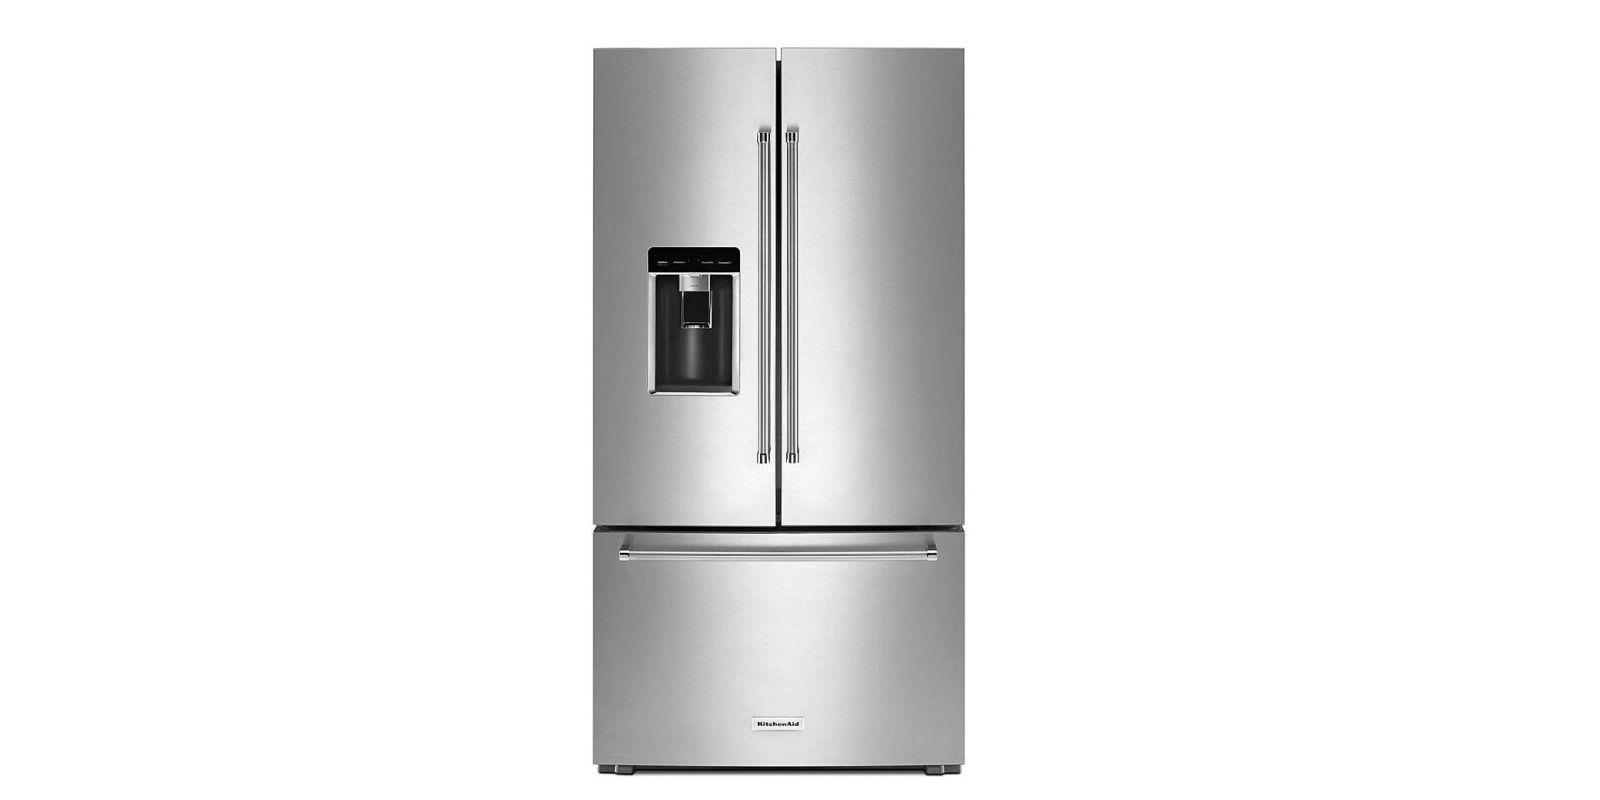 Largest Capacity Refrigerator 20 Best Refrigerators Reviews And Refrigerator Tests